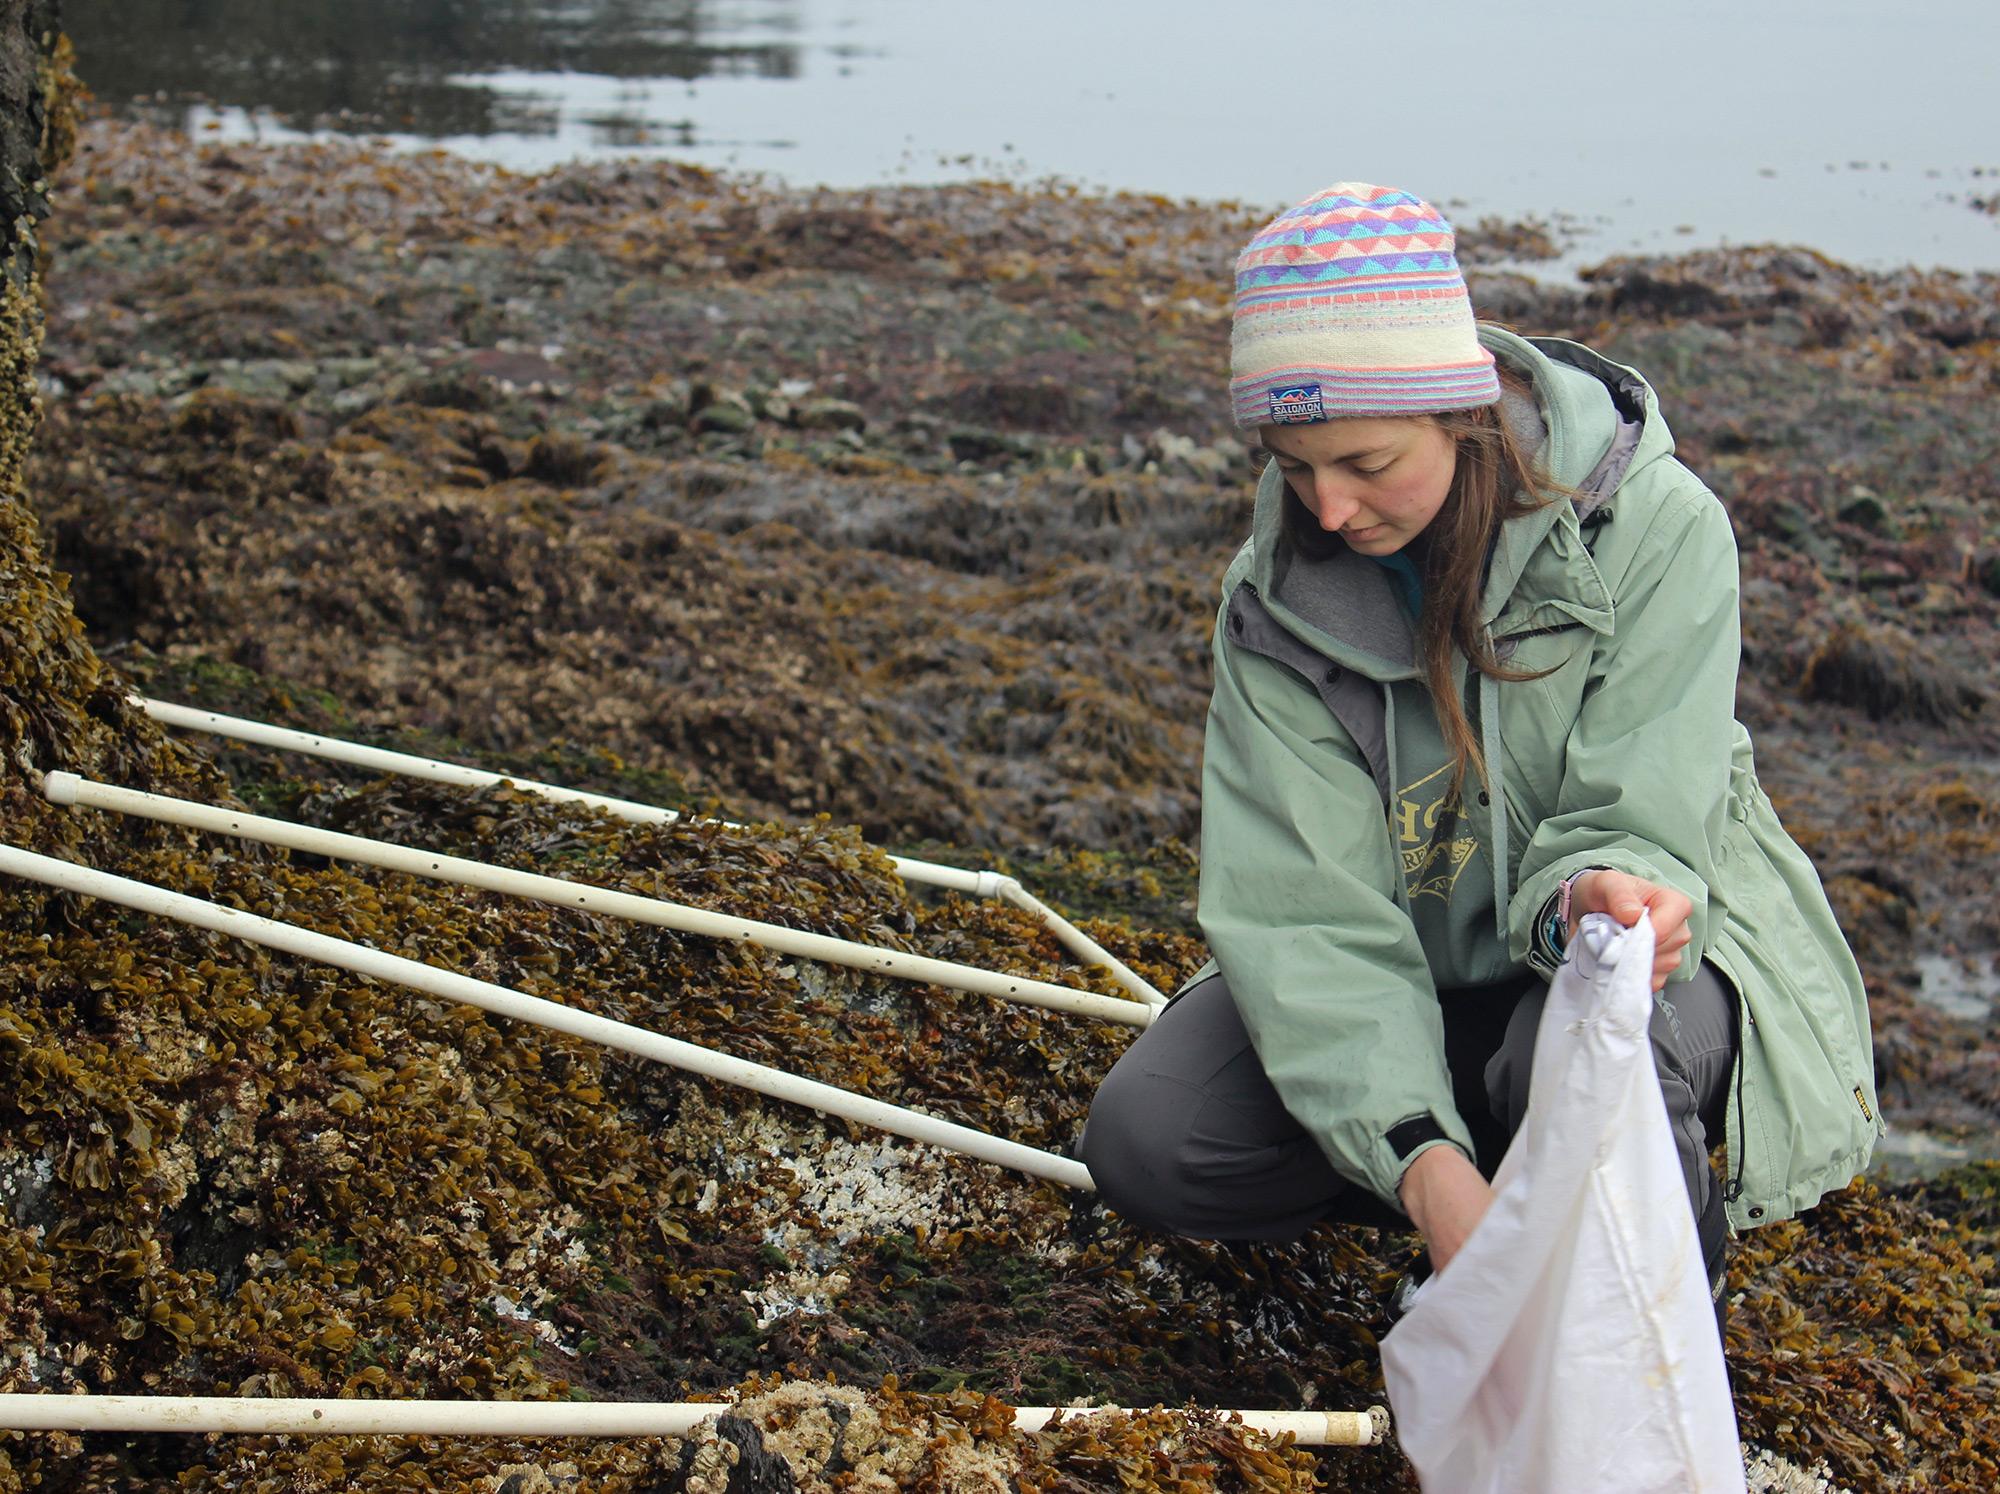 Marta Ree harvesting rockweed